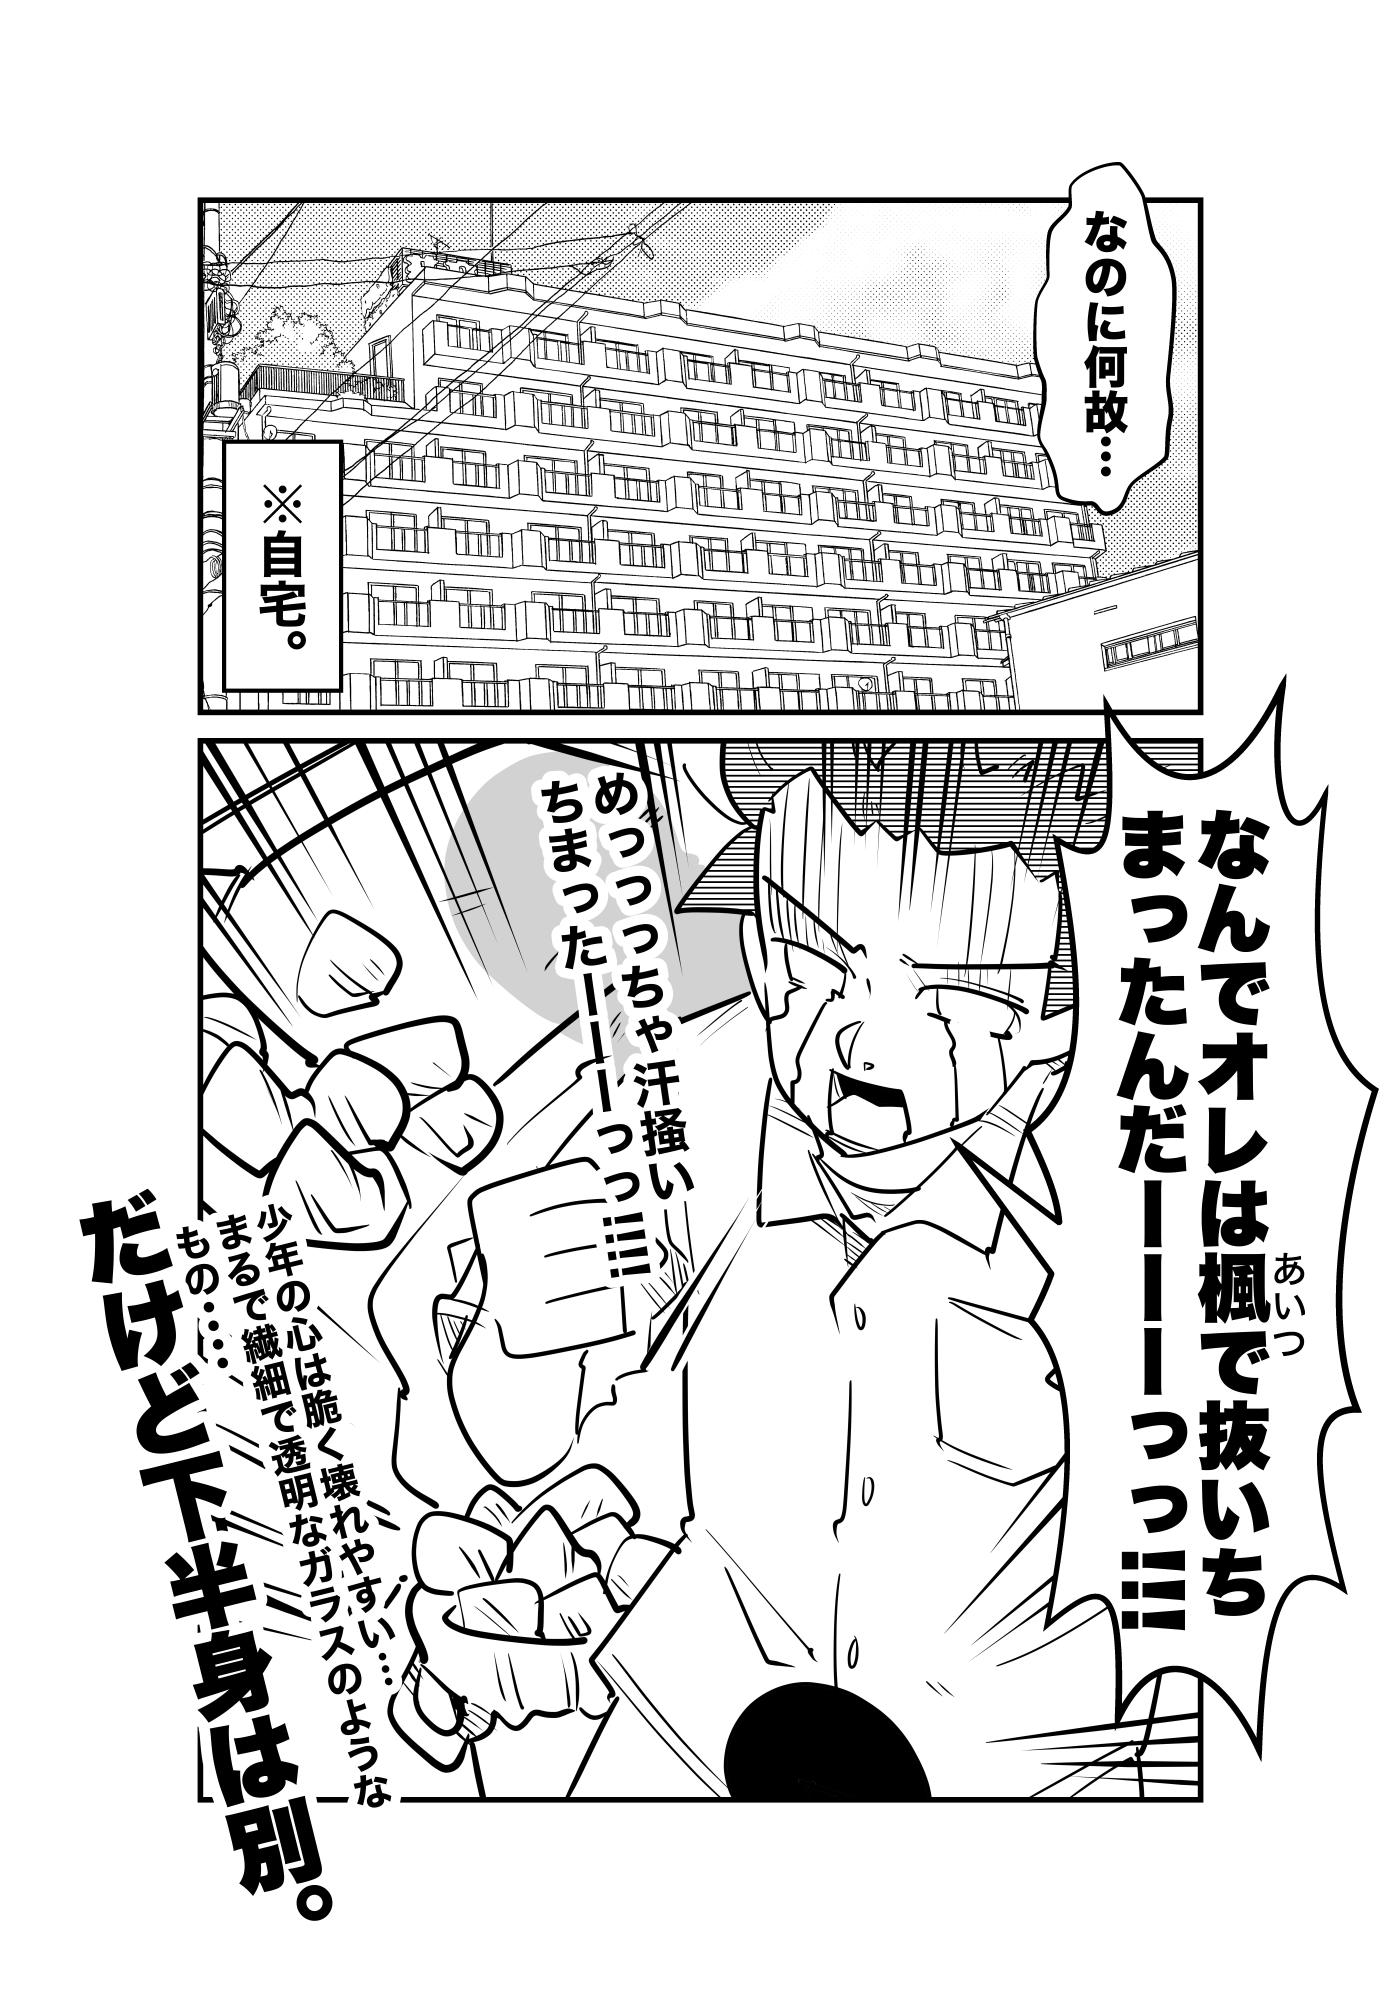 f:id:terashimaru117:20210915015301p:plain